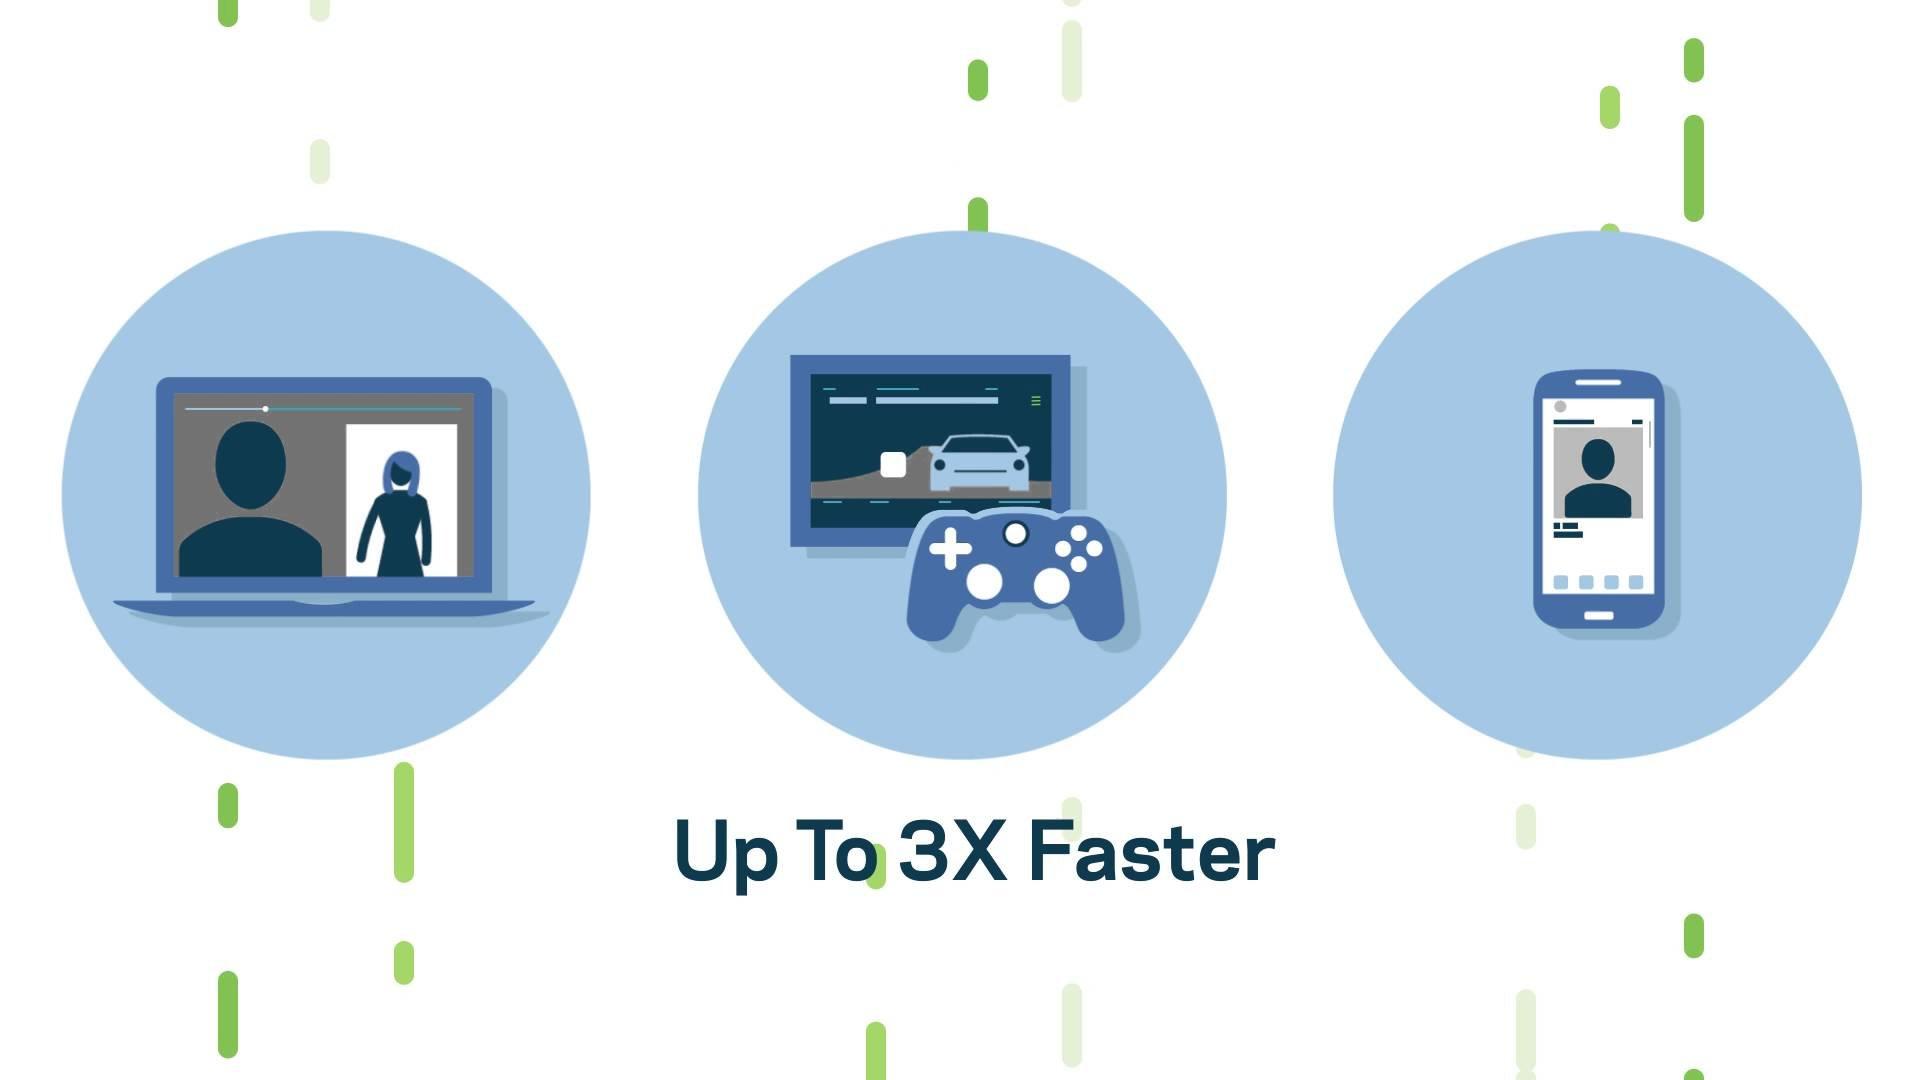 Linksys EA7500 Max-Stream™ AC1900 MU-MIMO Gigabit Wi-Fi Router